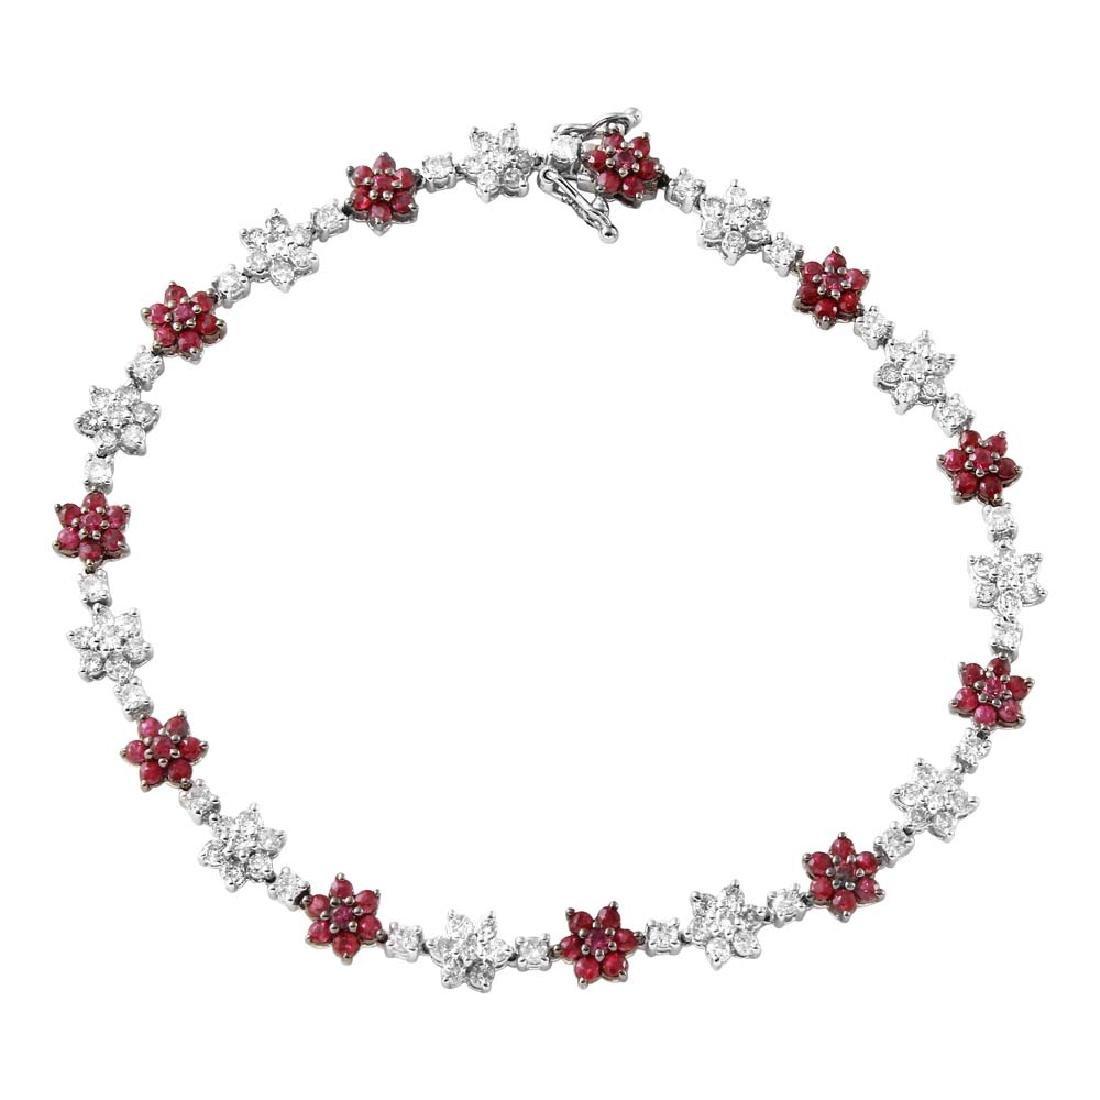 Genuine 3.28 TCW 14K White Gold Ladies Bracelet